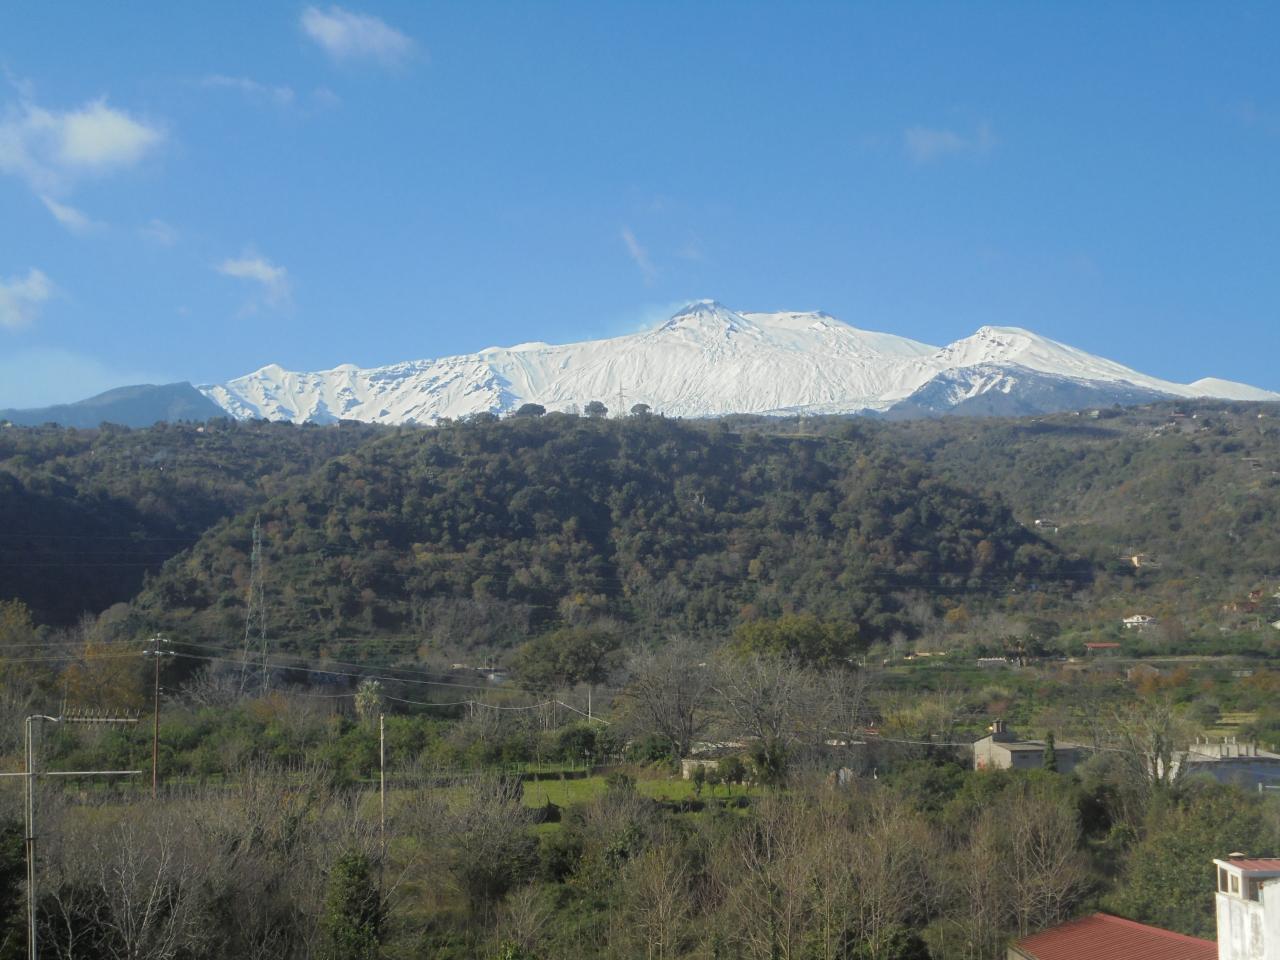 Appartement de vacances MARE - ETNA - TAORMINA (2618228), Mascali, Catania, Sicile, Italie, image 27